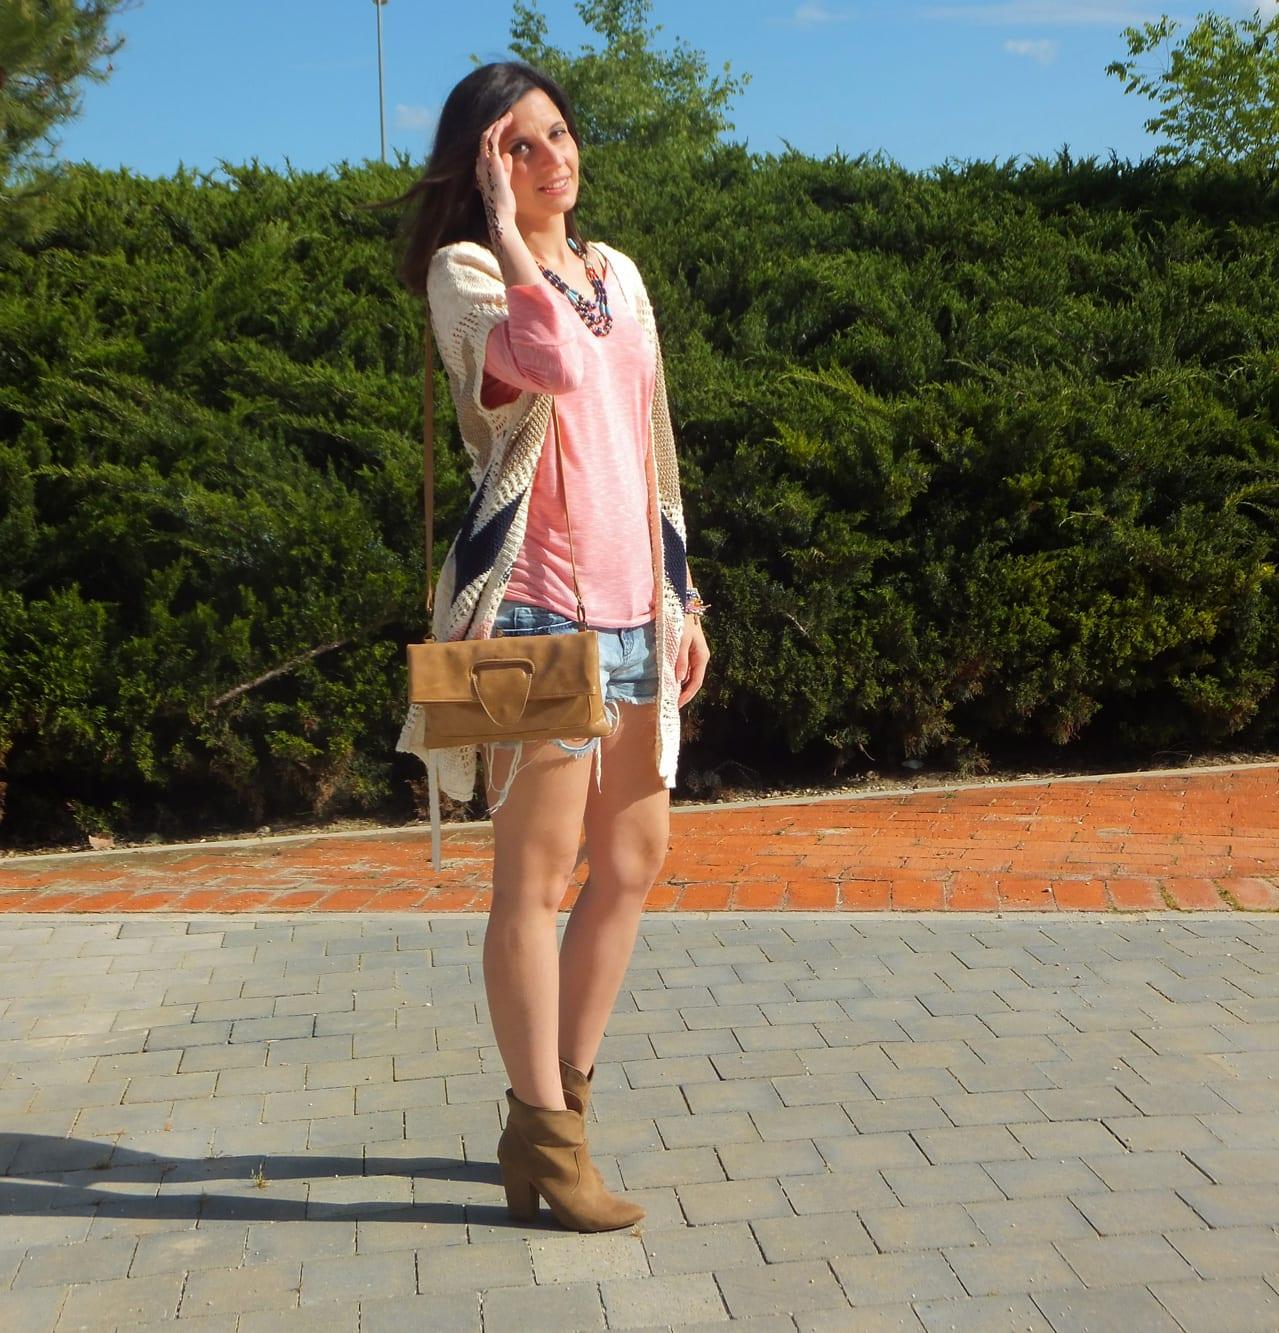 fashion blogger con look boho chic